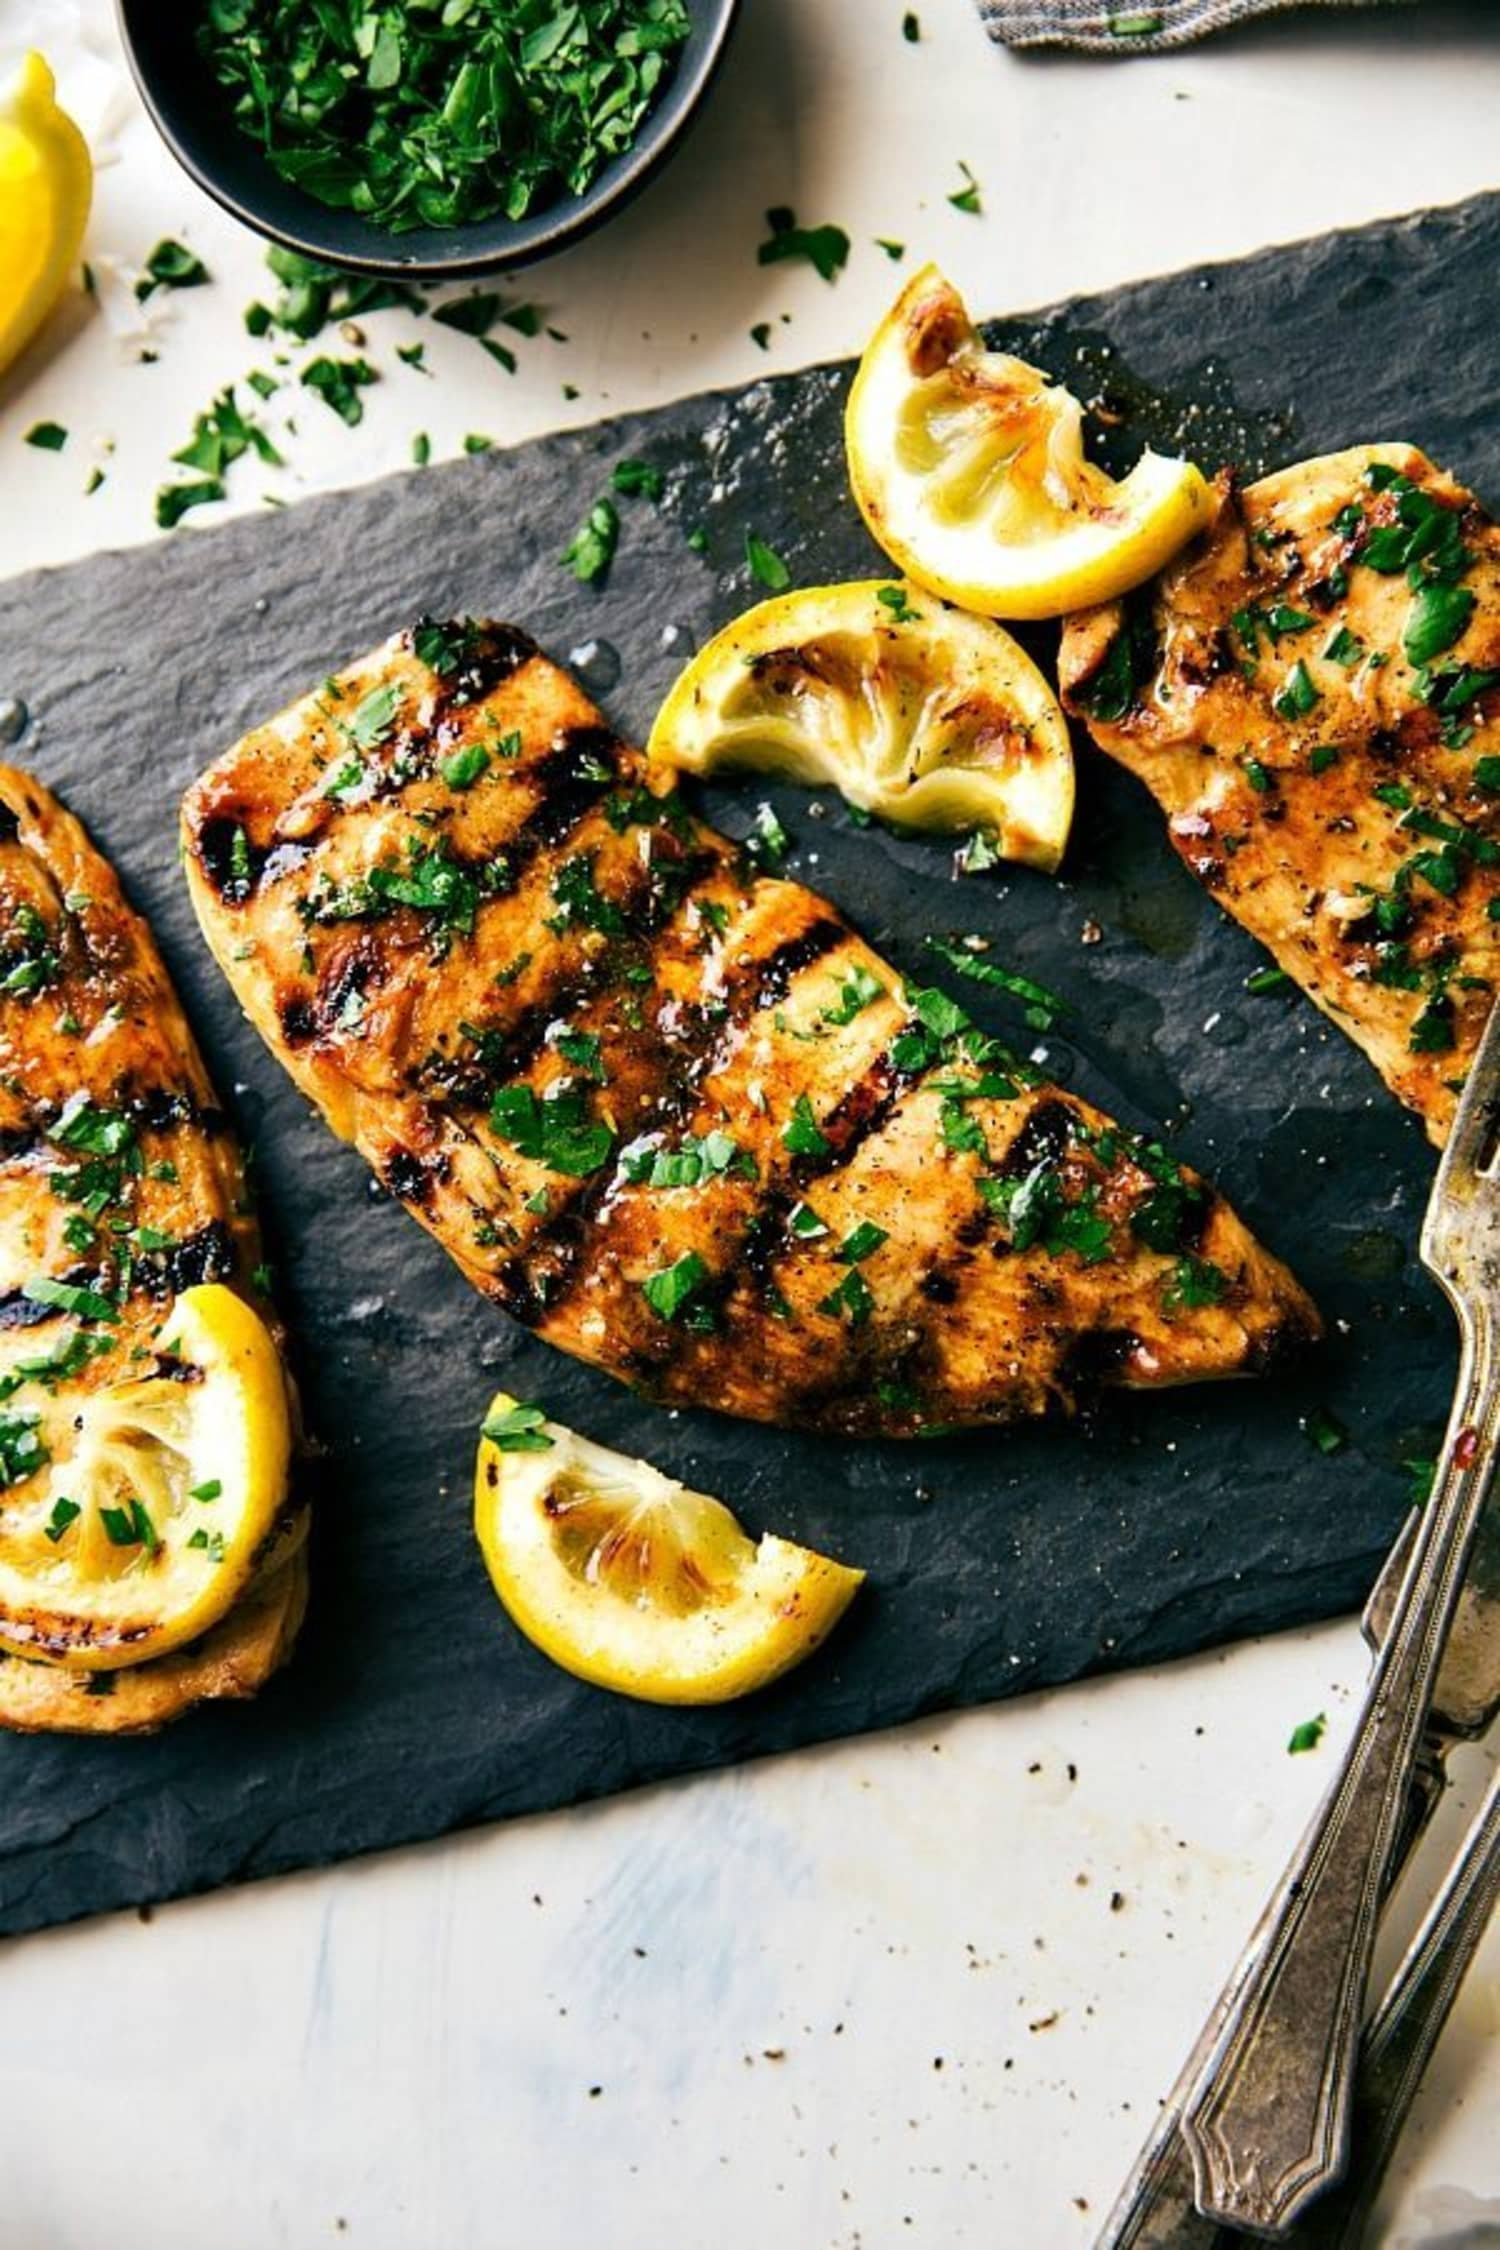 Memorize This Grilled Chicken Marinade Recipe ASAP